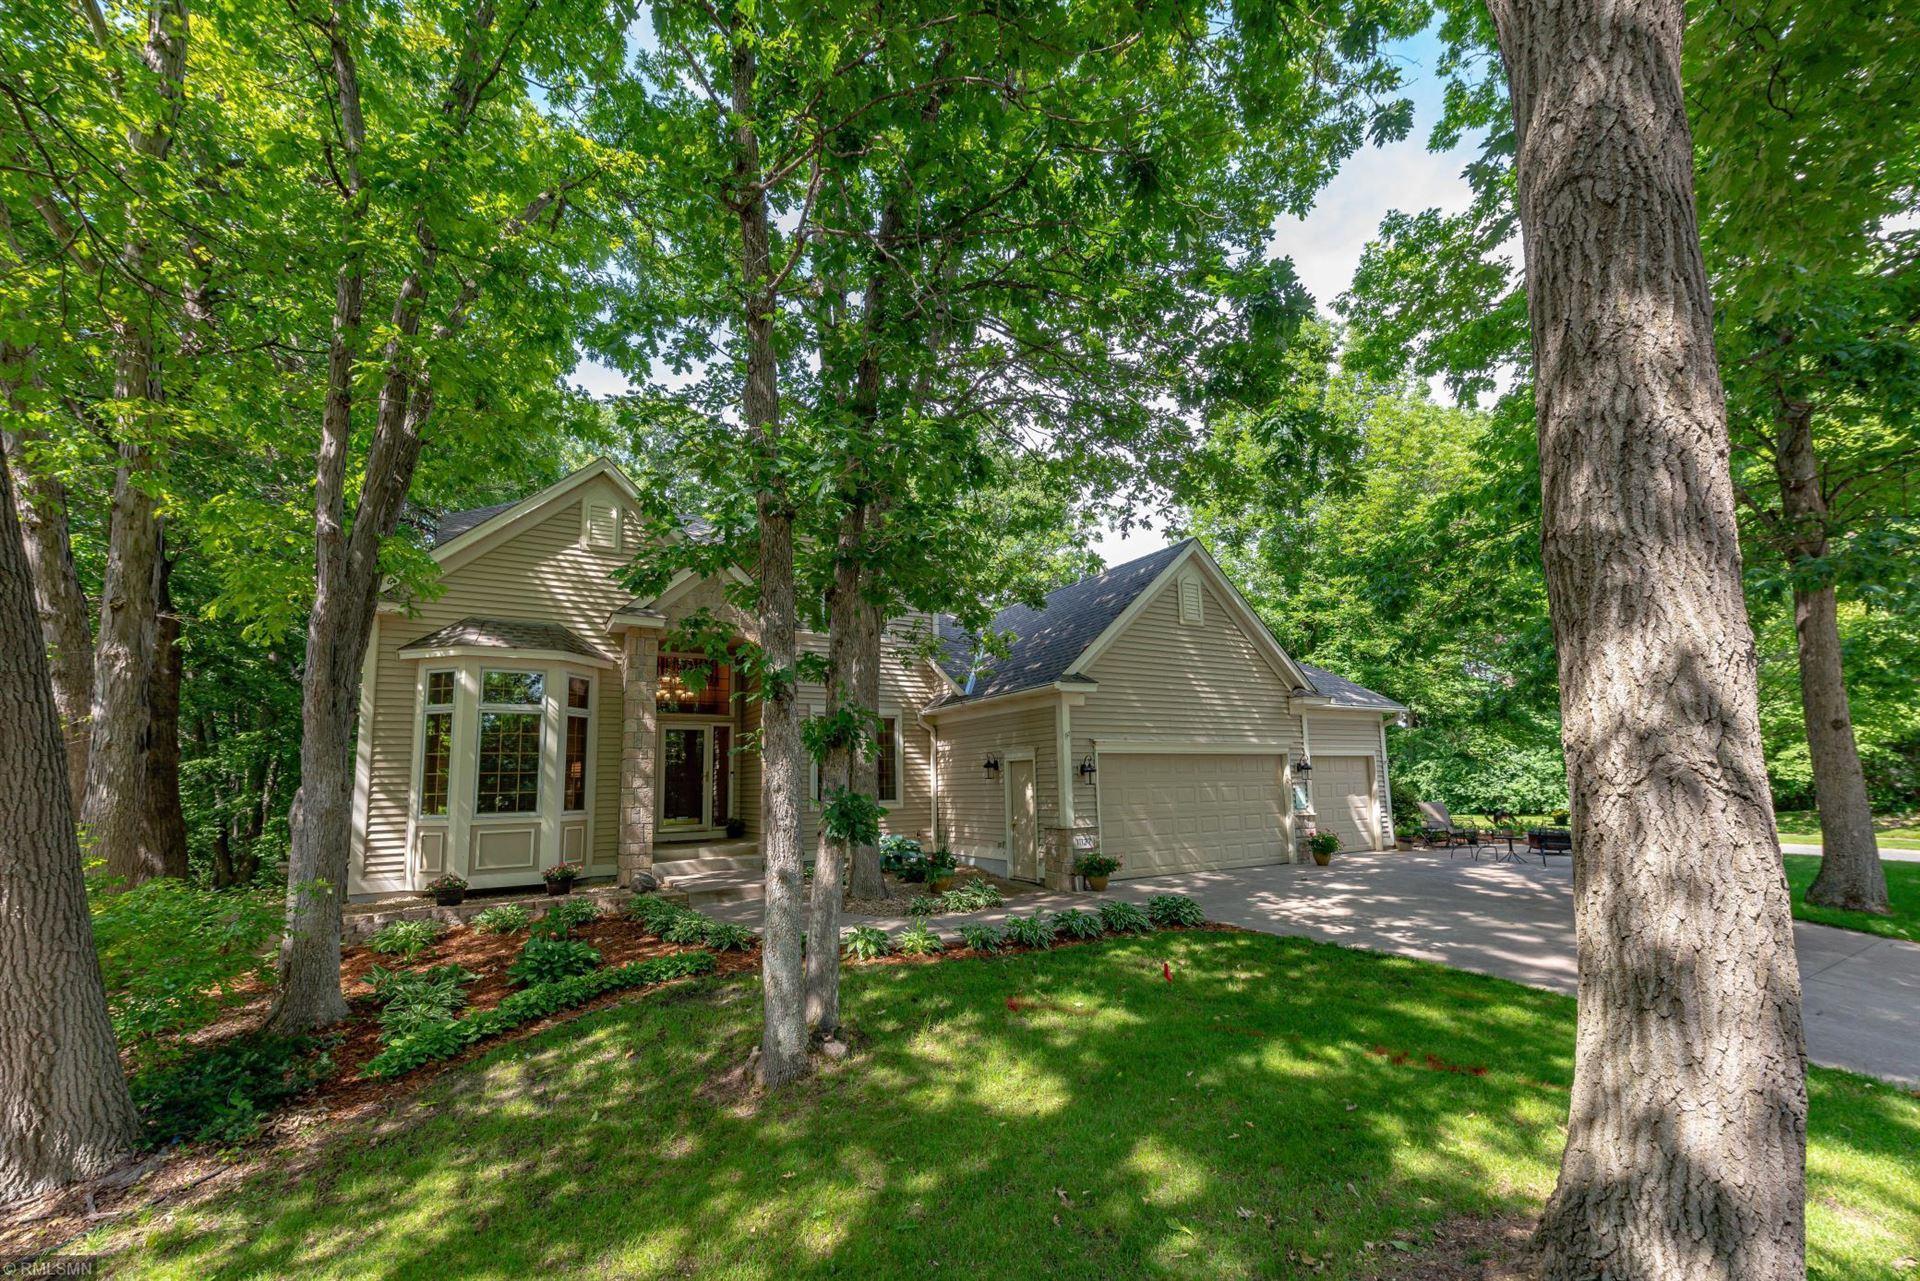 11137 Woods Trail N, Champlin, MN 55316 - #: 5615556